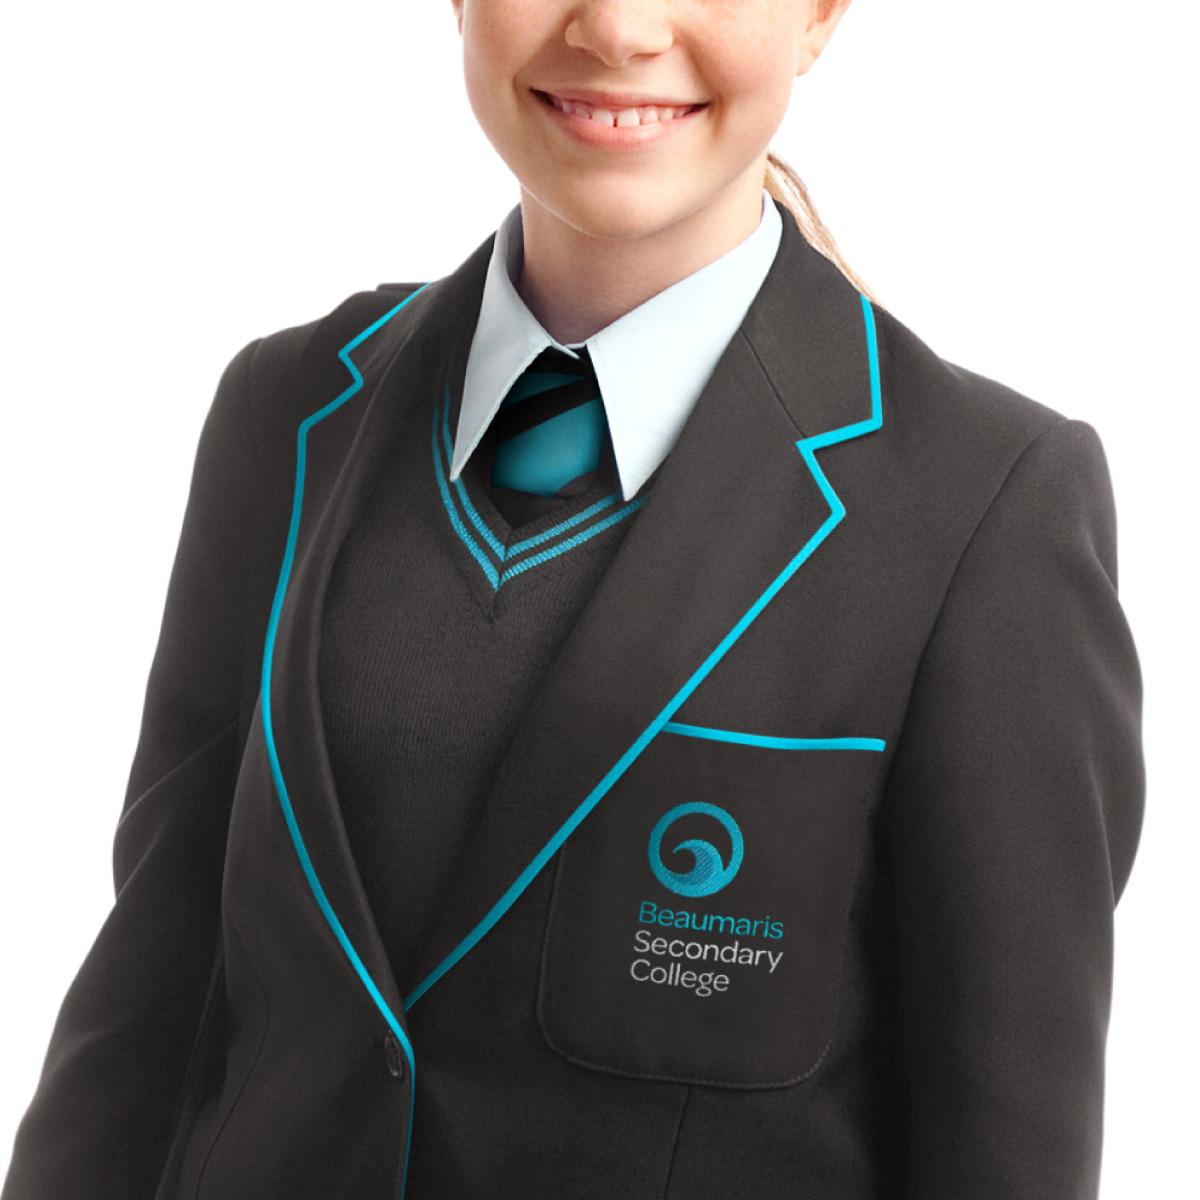 Beaumaris Secondary College Brand Identity